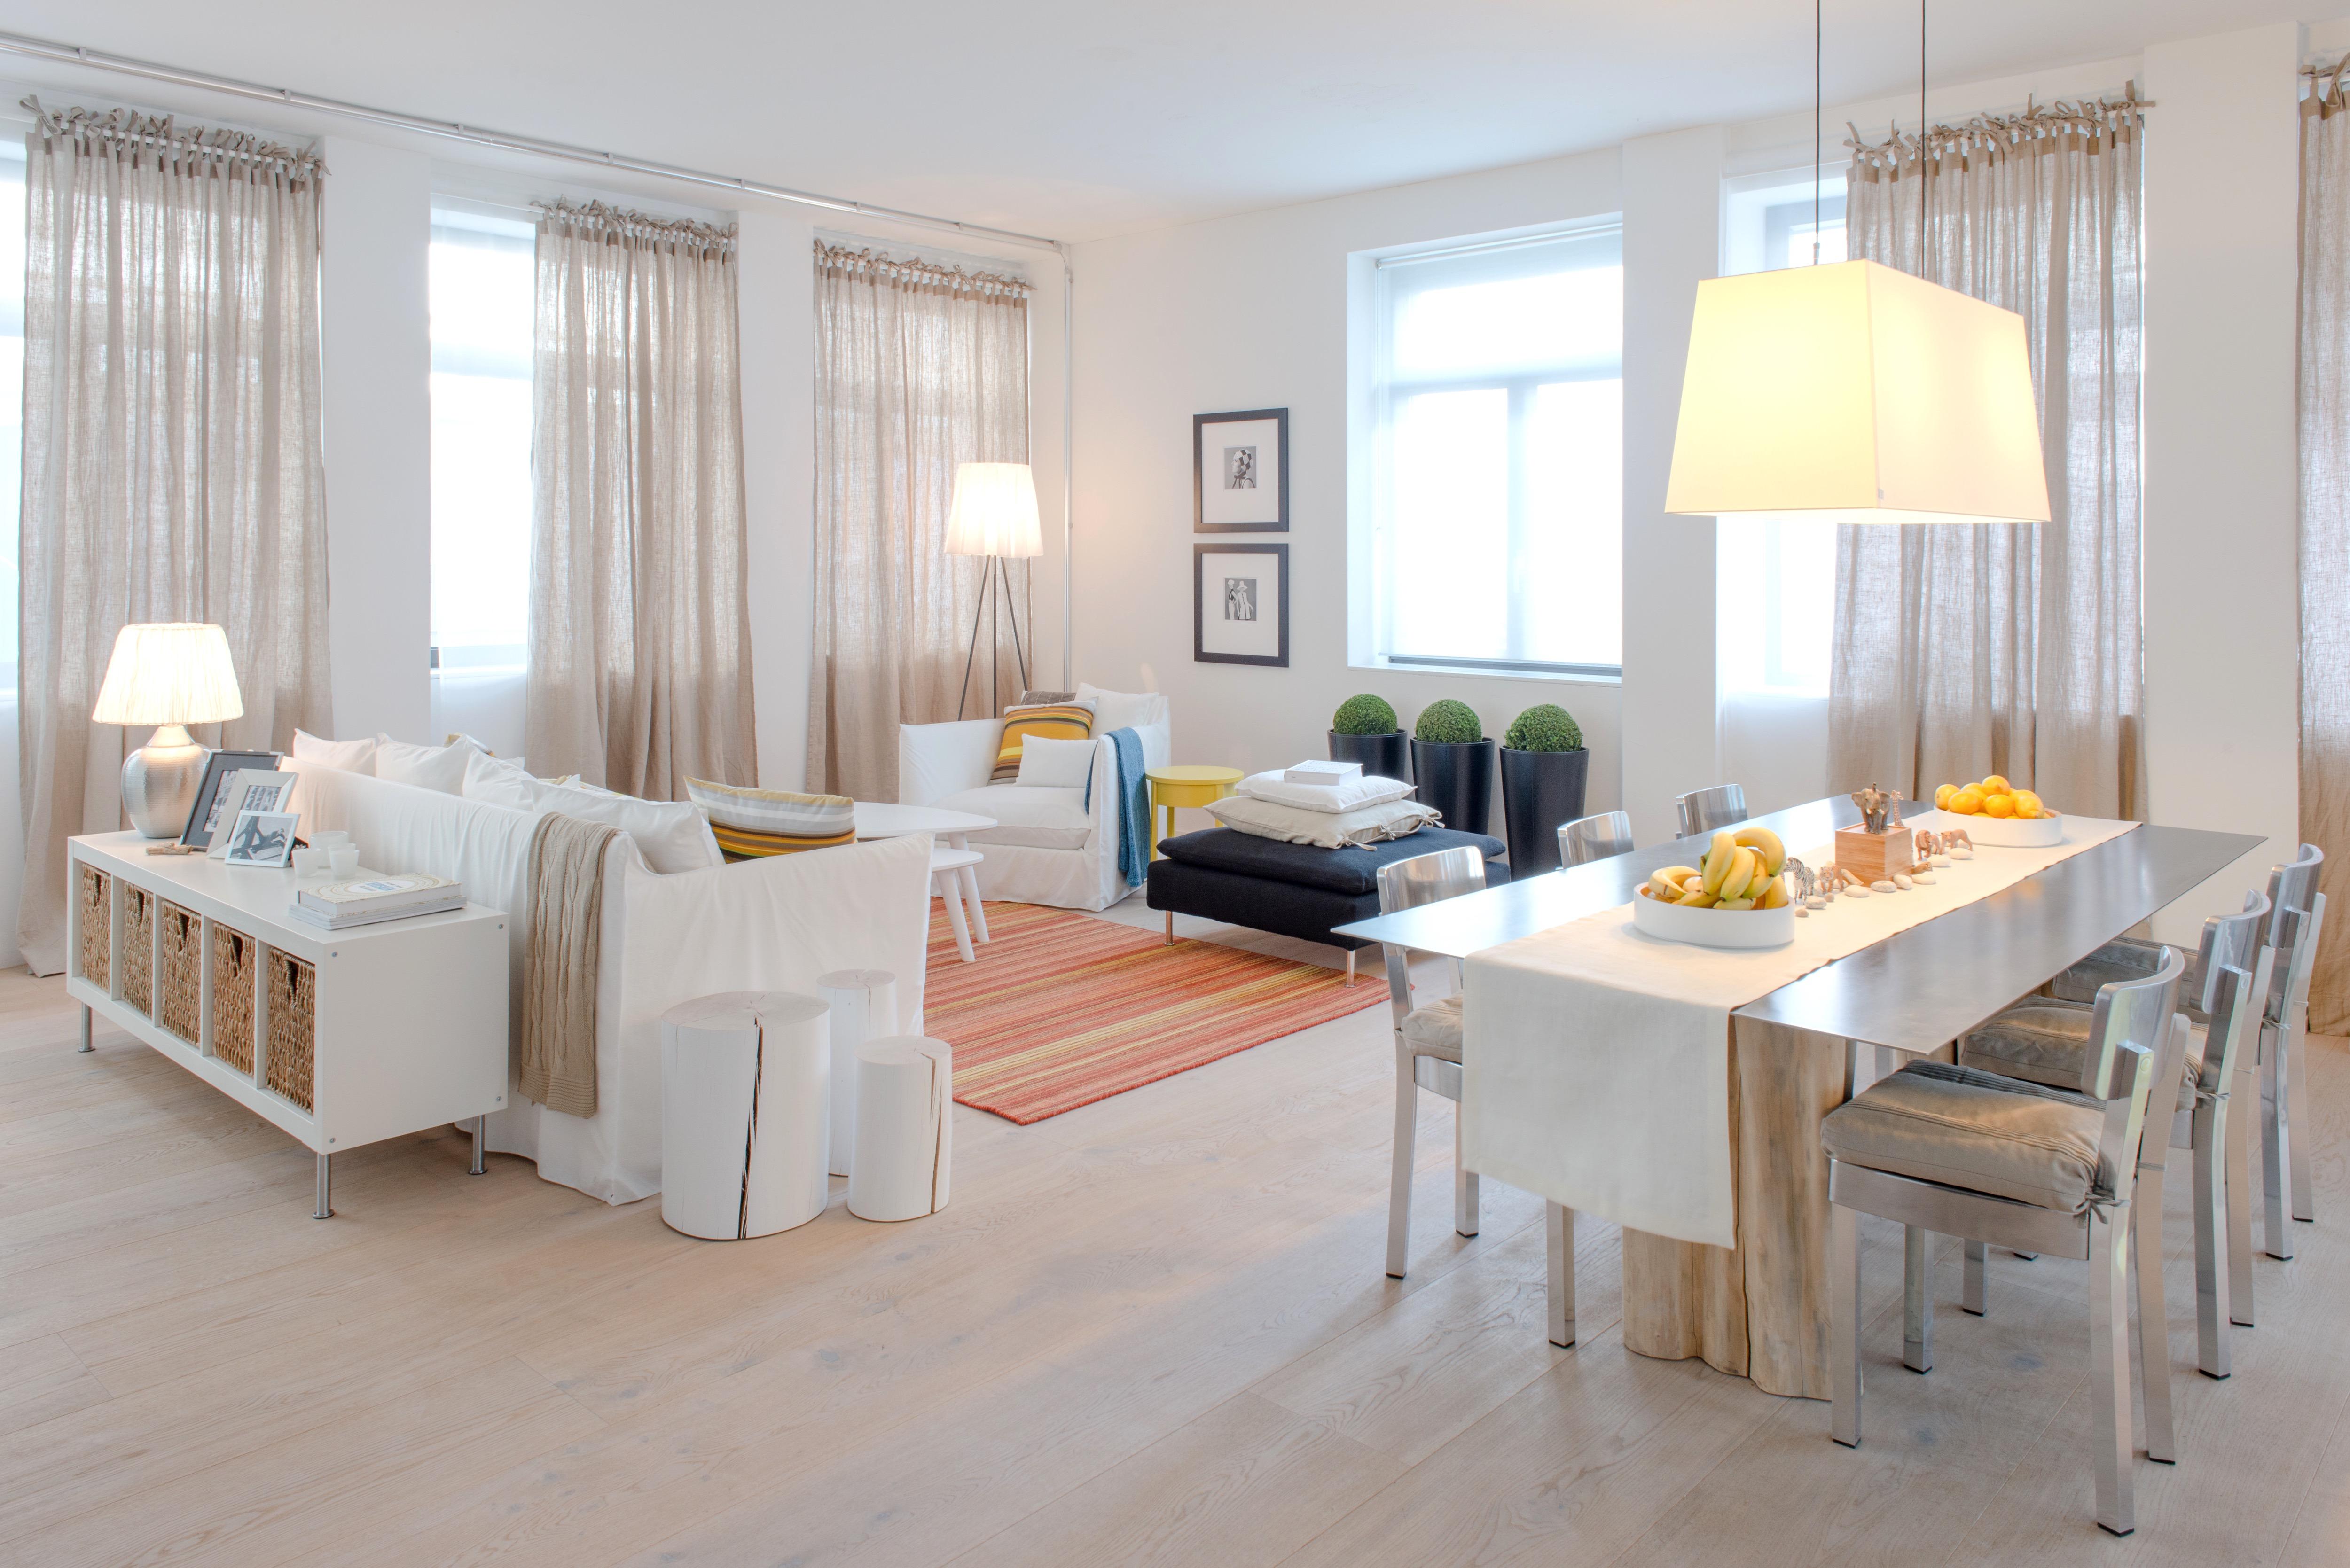 Wohnzimmer Ideen Ikea waitingshare